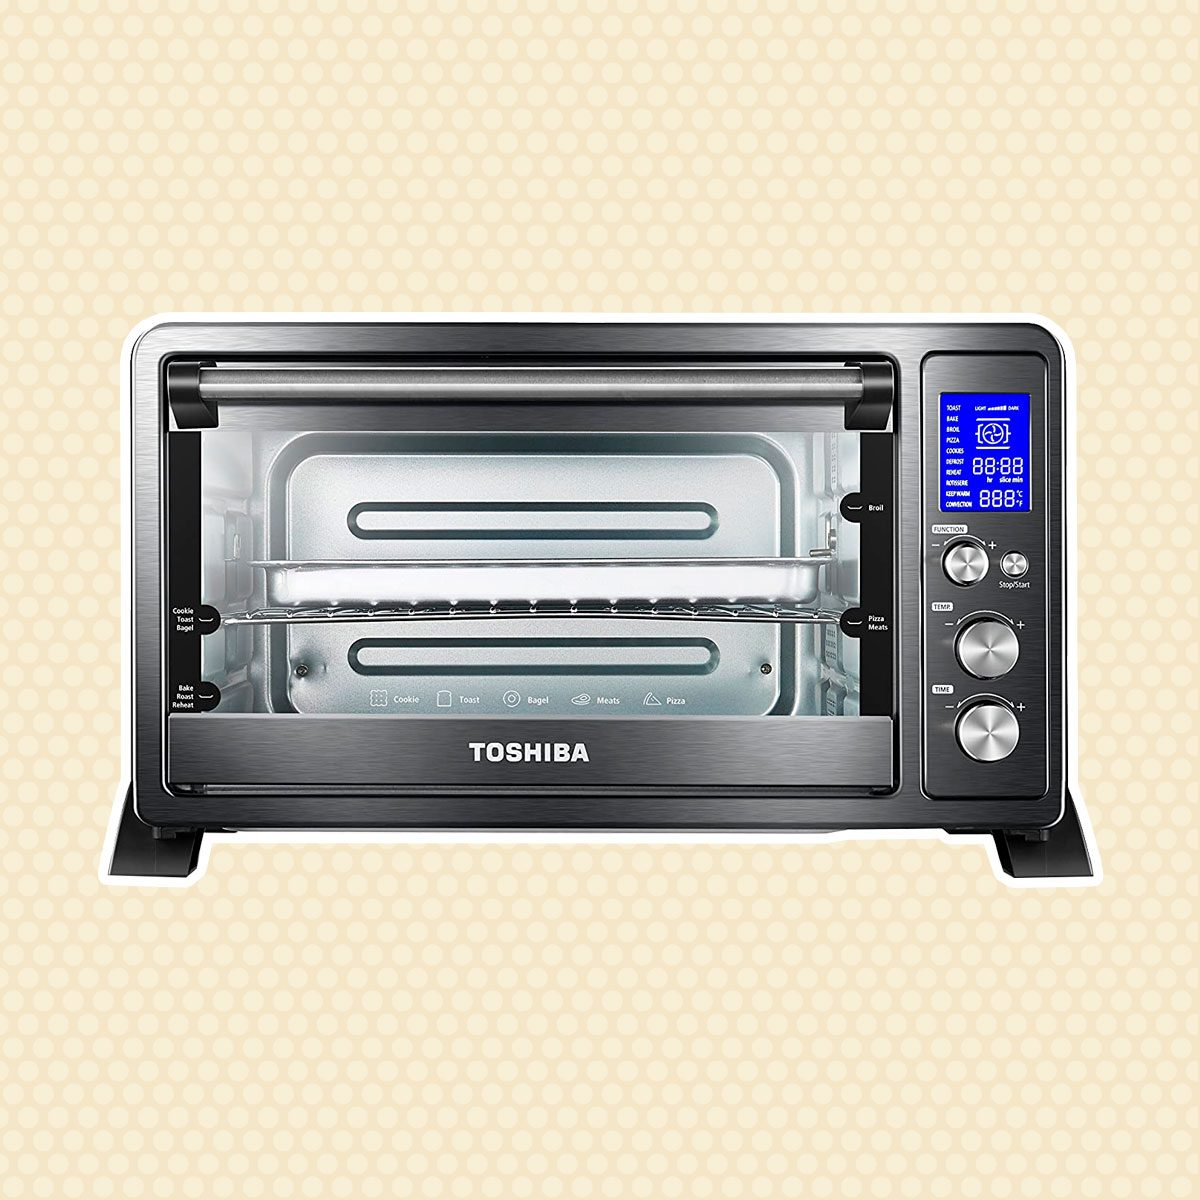 Toshiba Digital Toaster Oven